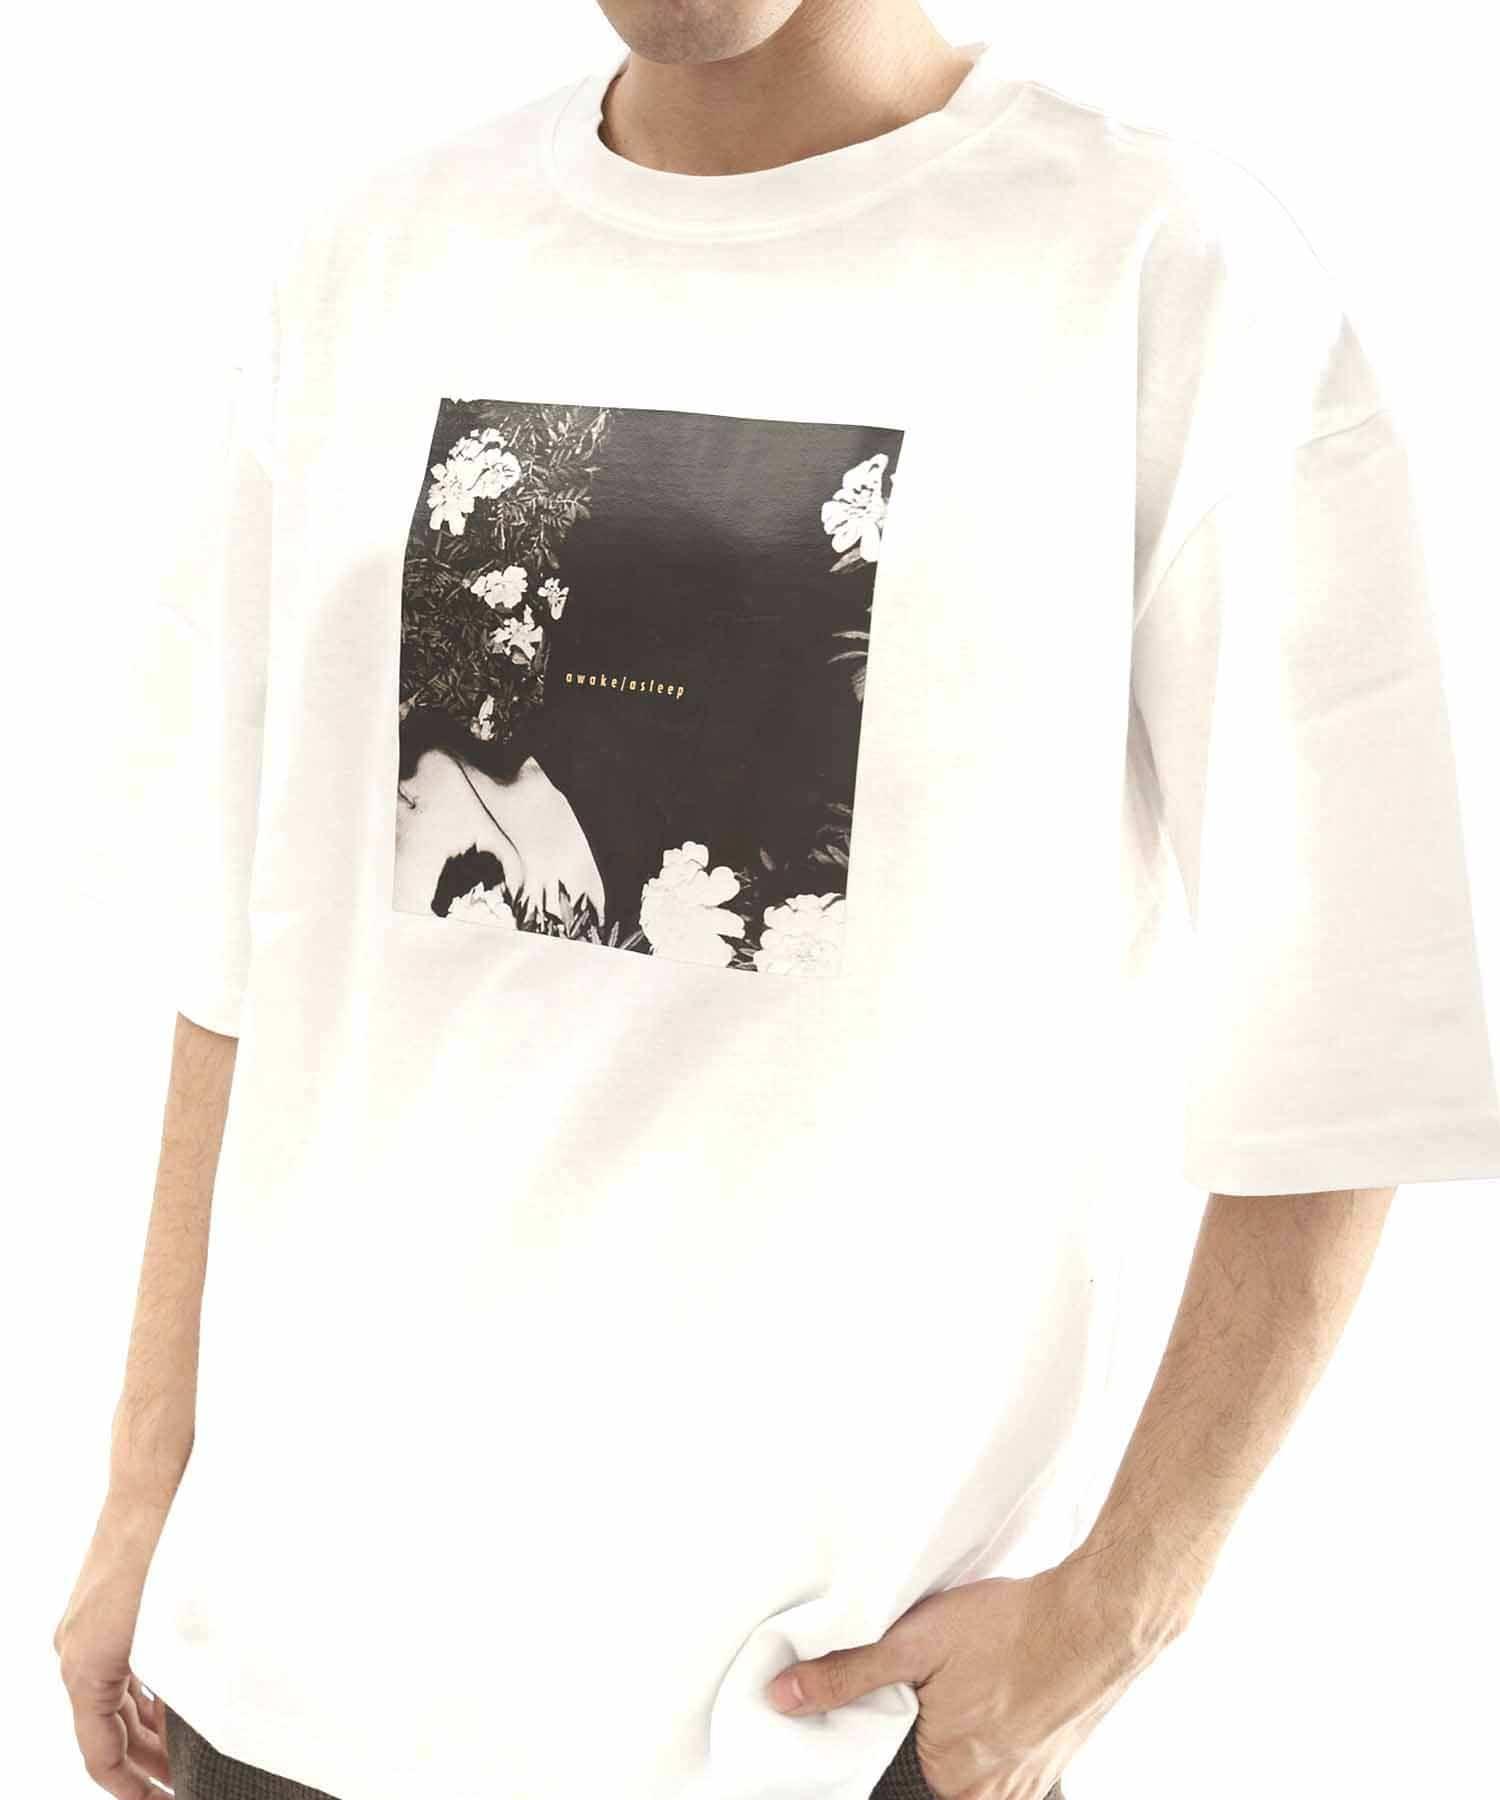 3COINS(スリーコインズ) ライフスタイル 【JUKEBOX PROJECT】AWATシャツ その他1